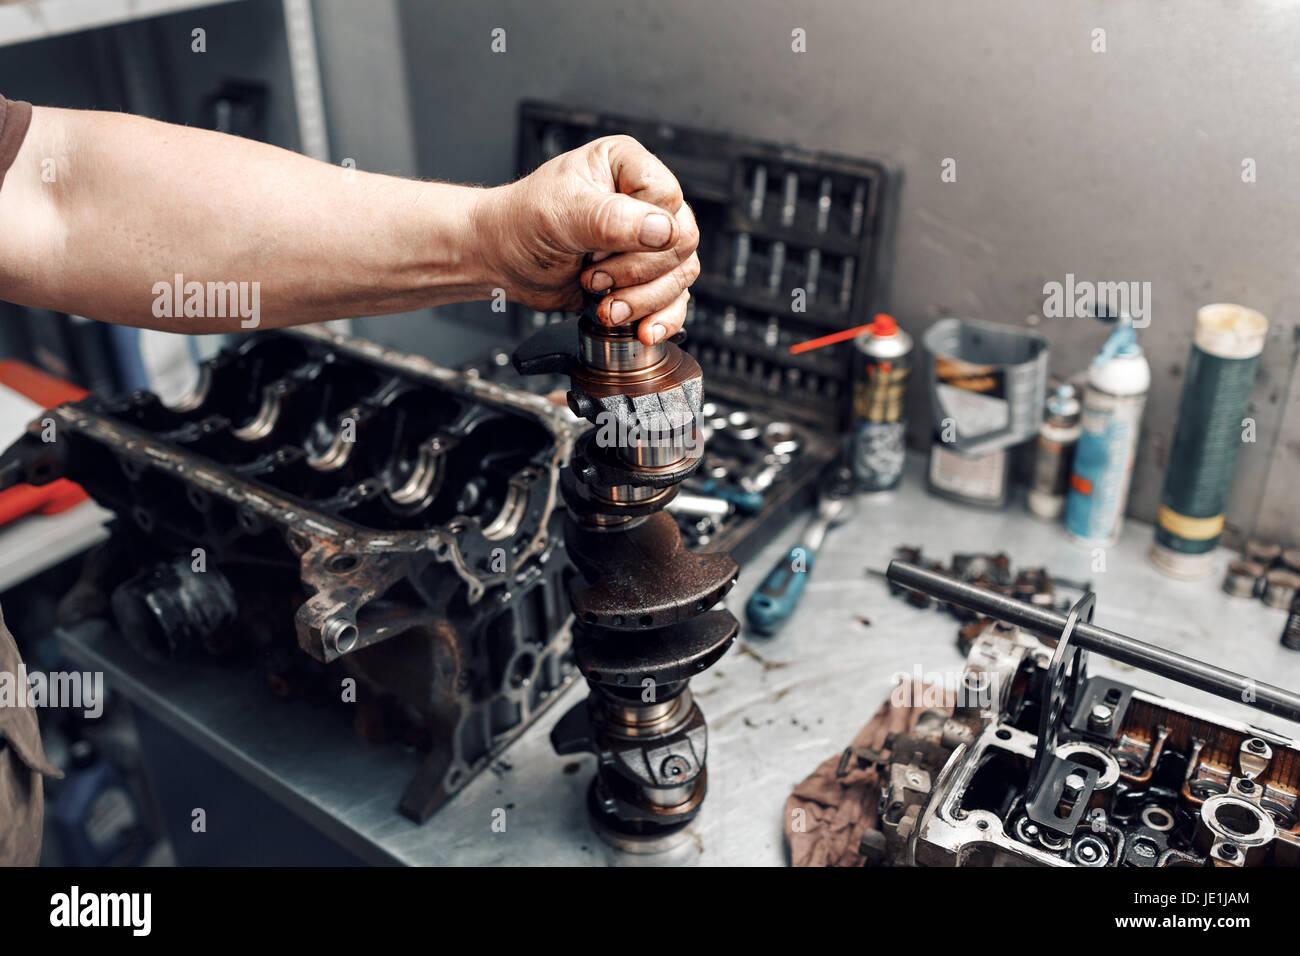 mechanic repairman at automobile car engine maintenance repair work. the crankshaft of the engine - Stock Image